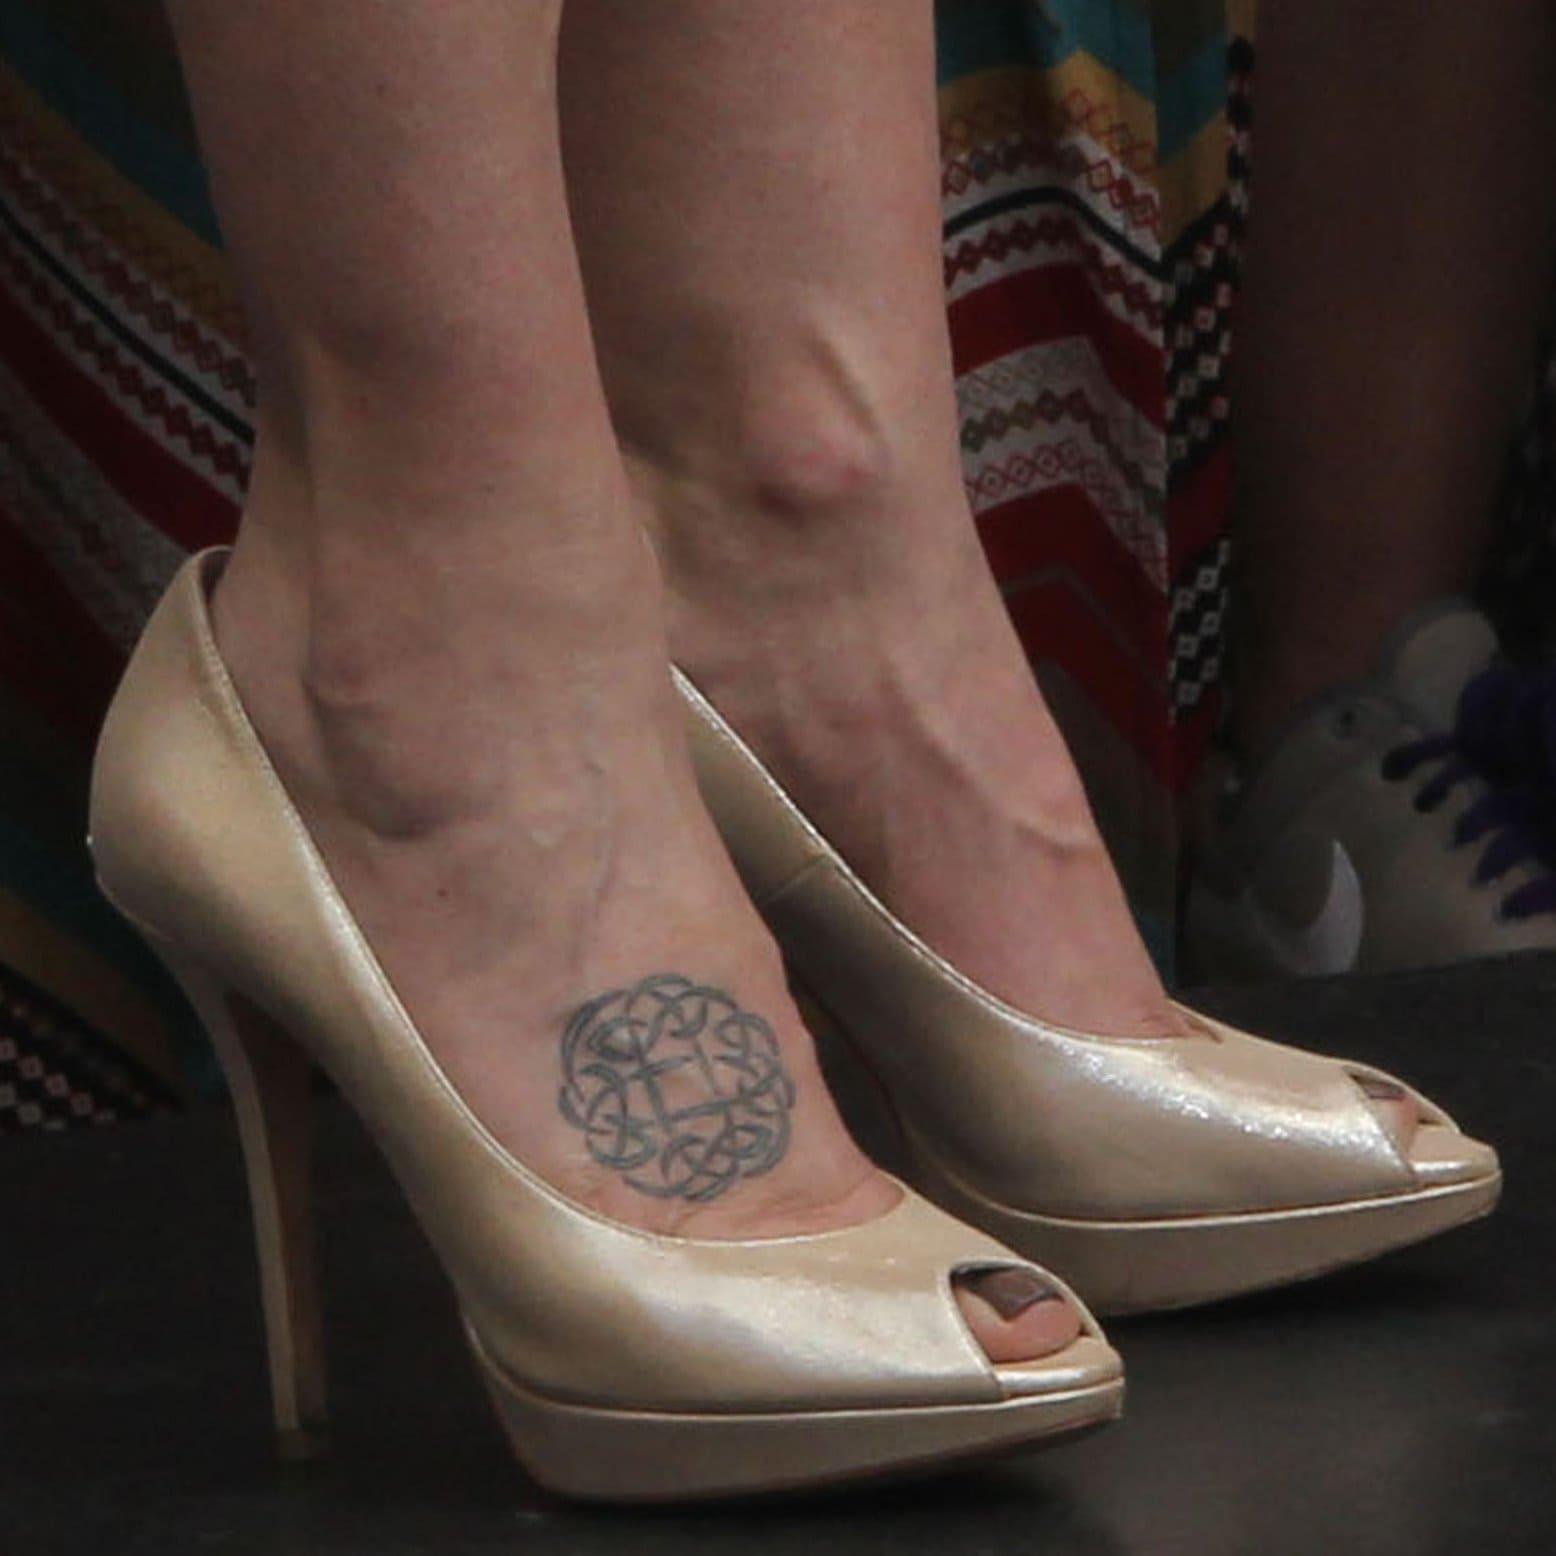 Lisa Marie Presley and Benjamin Keough got matching tattoos in 2009